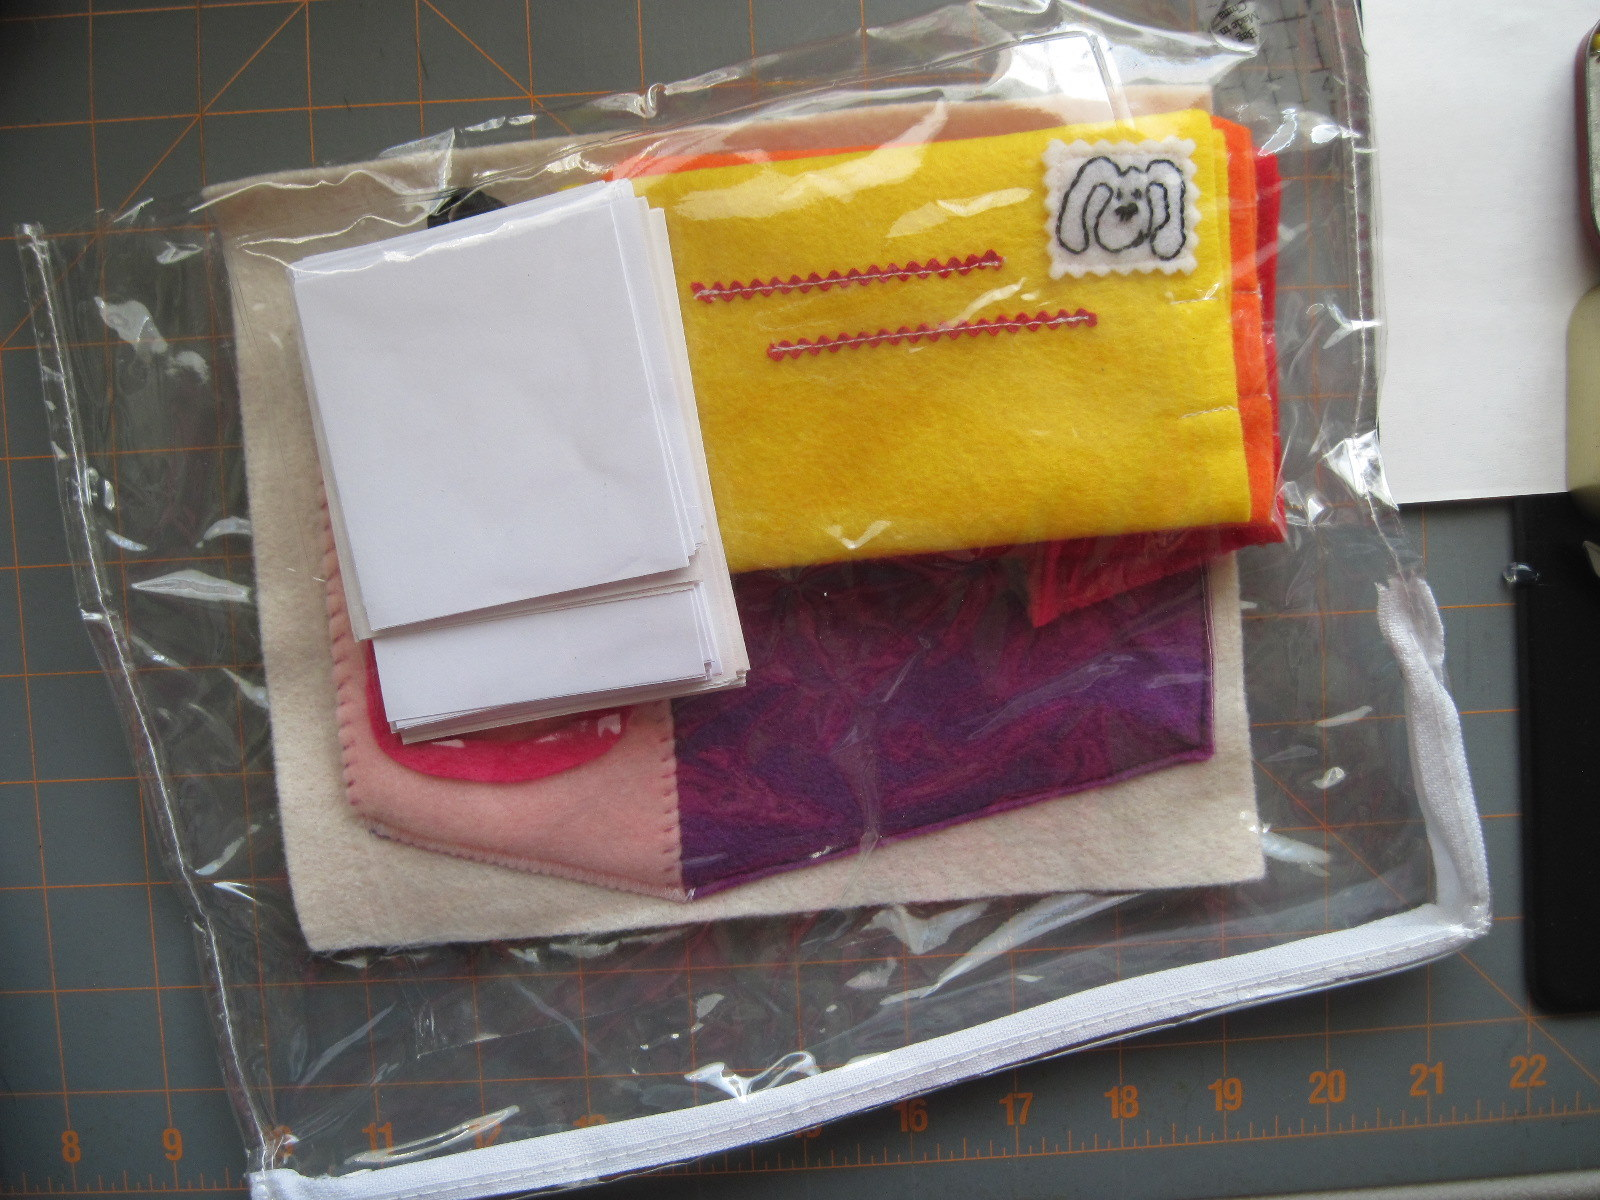 http://4.bp.blogspot.com/-6u5aXkaTR8M/T9qtizUHArI/AAAAAAAACyA/mP_DMccO_LY/s1600/busy+bags+-+mailbox+9.JPG